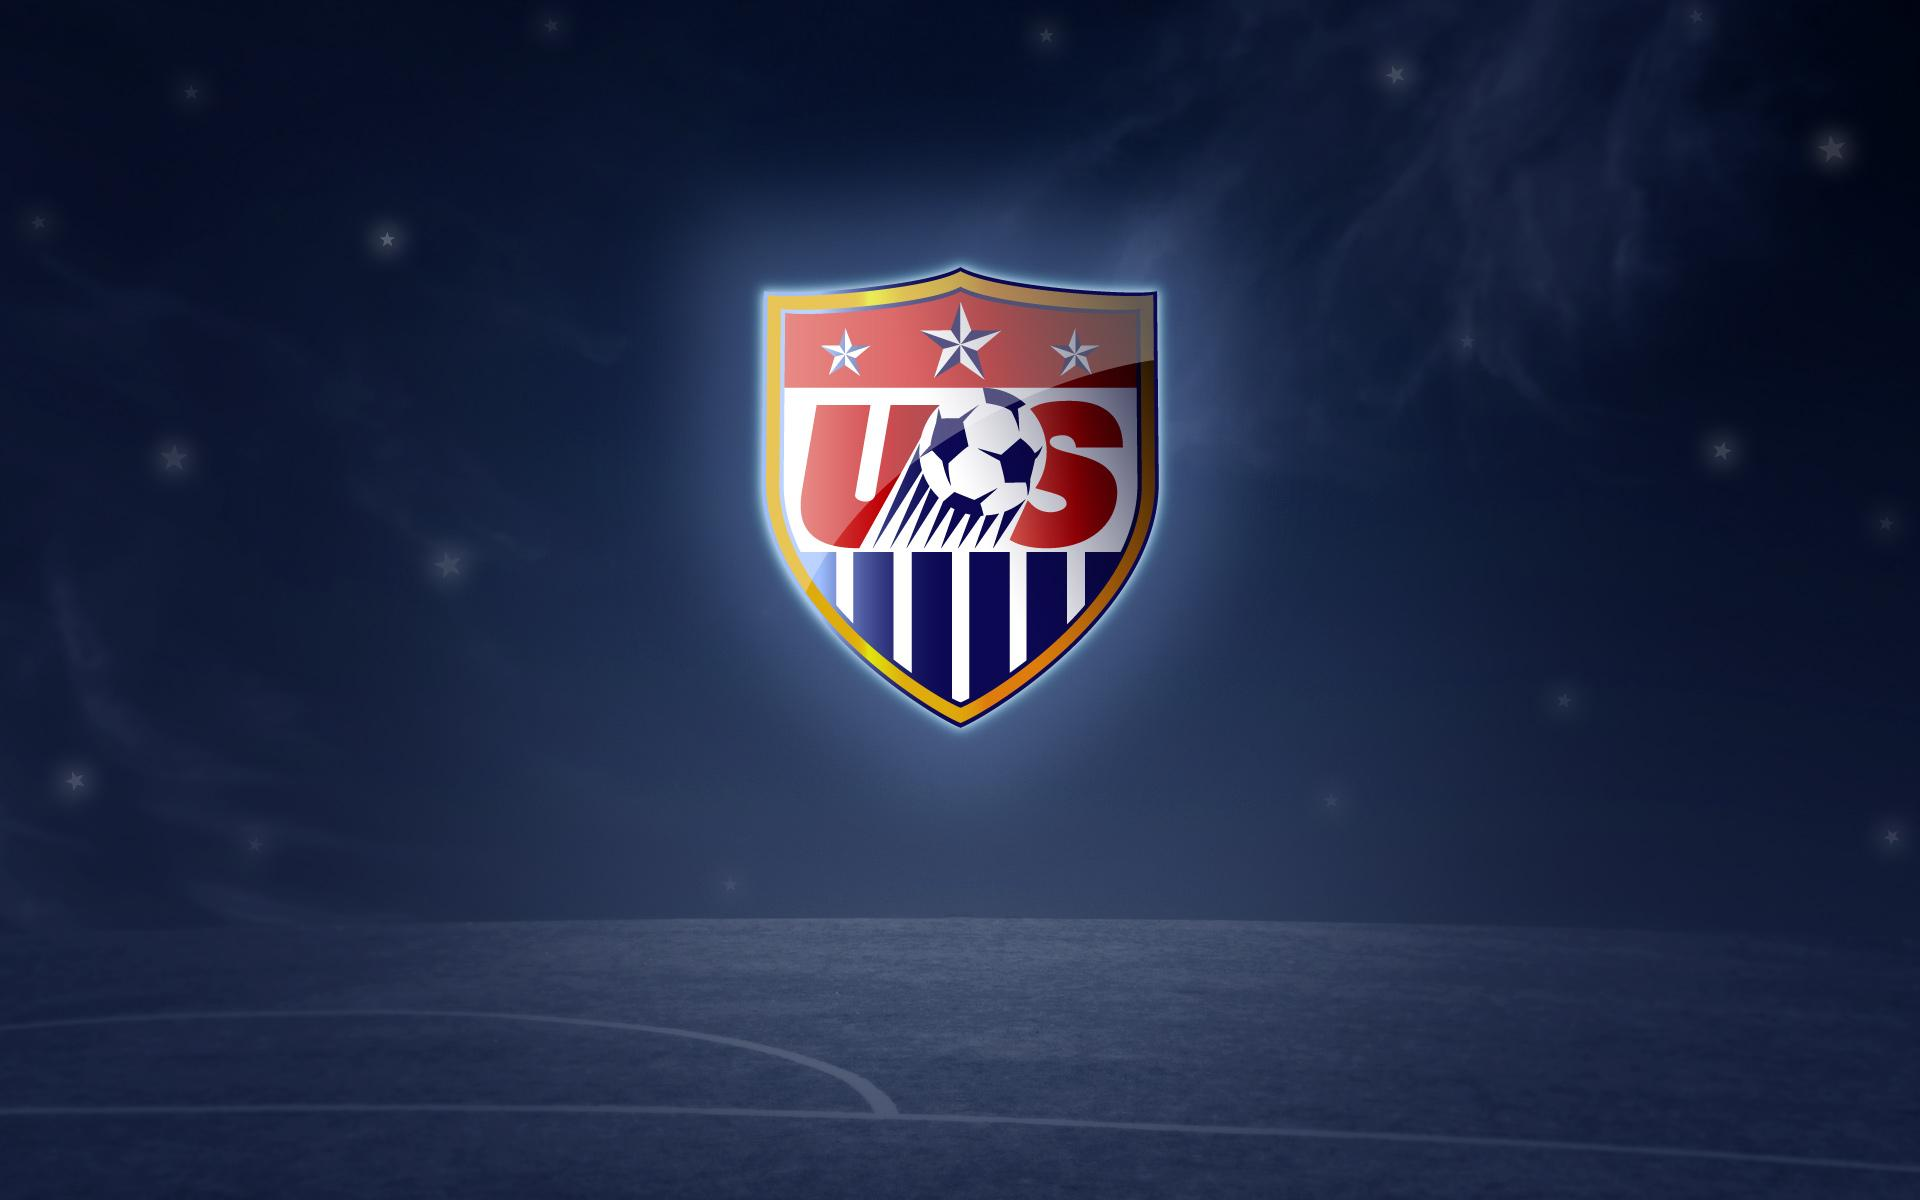 United Sates National Football Team Zoom Background 2